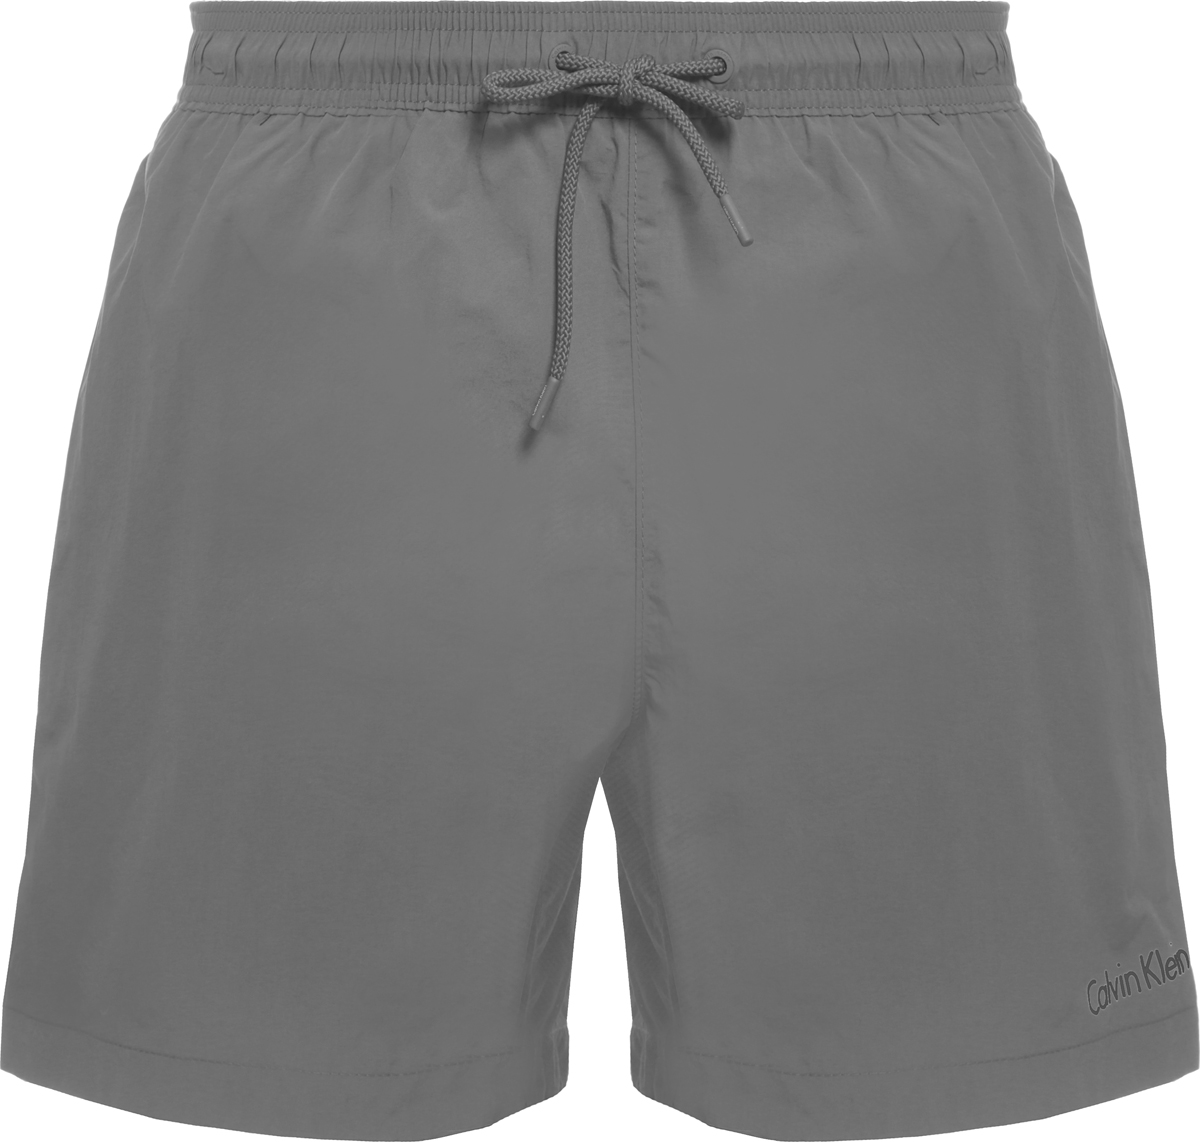 Шорты купальные мужские Calvin Klein Underwear, цвет: серый. KM0KM00163. Размер XL (52)